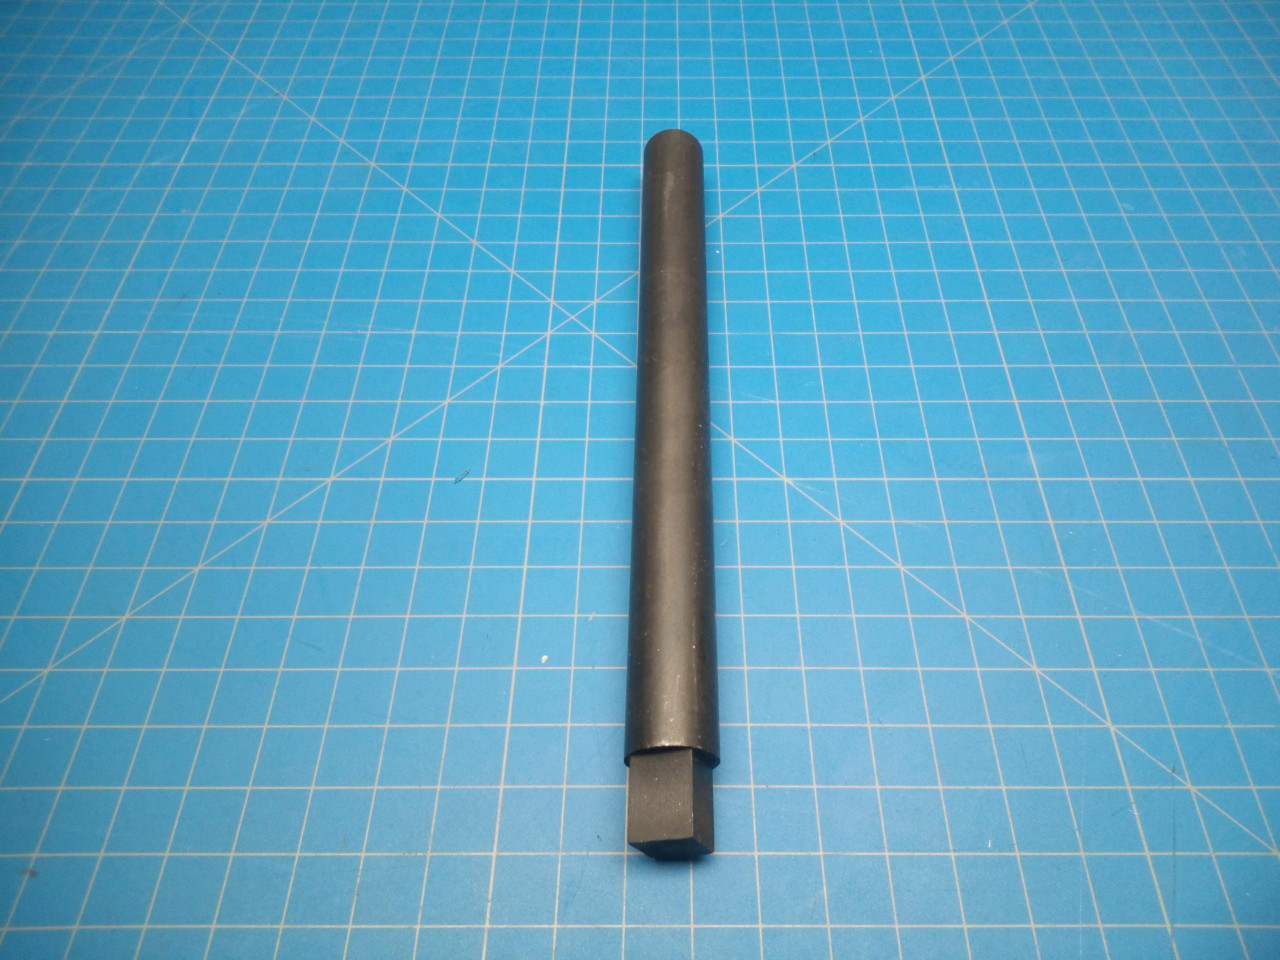 Cylinder 93E8252510 - P02-000314